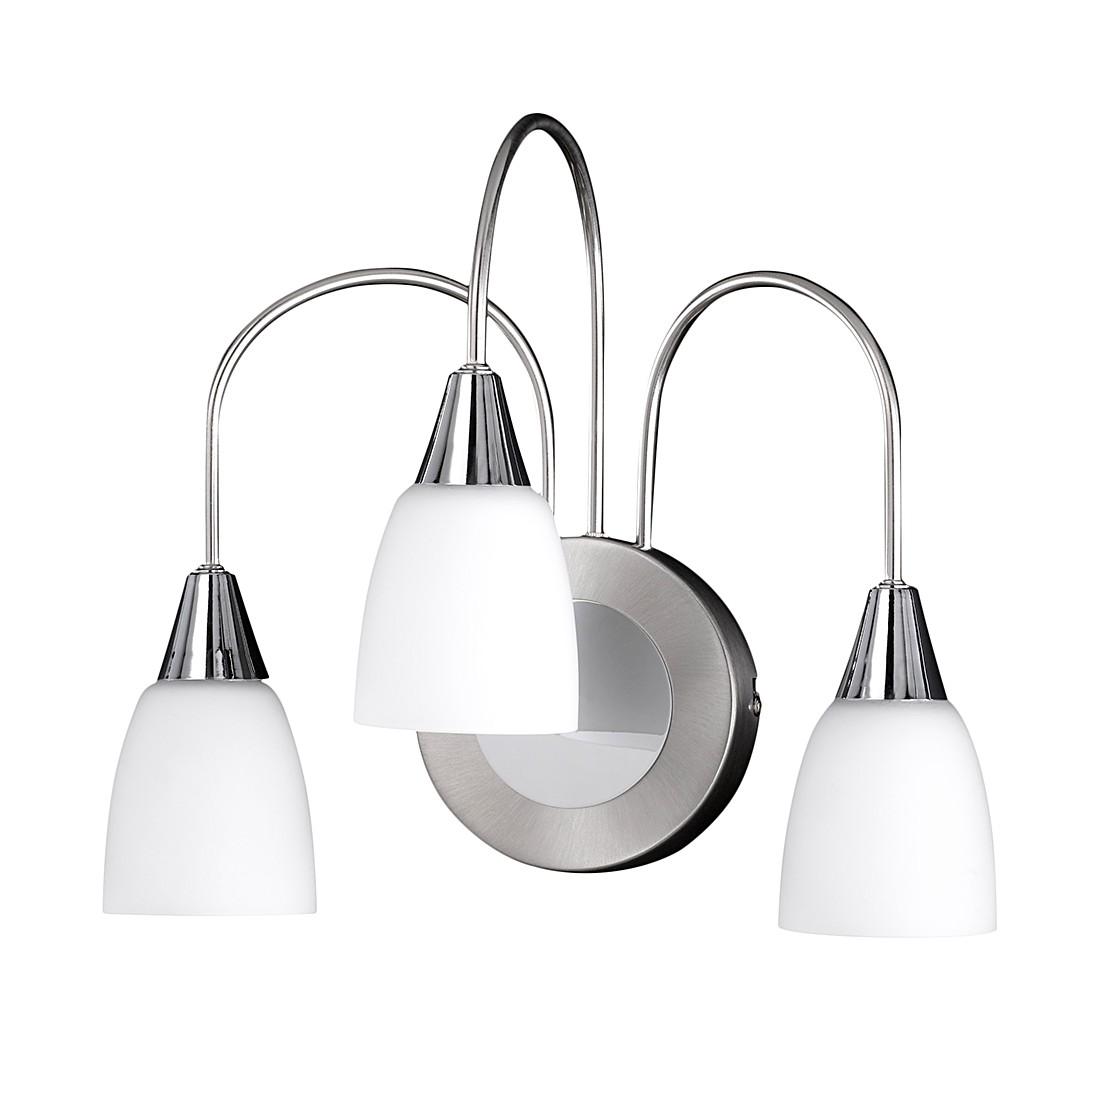 Wandleuchte CASA ● Metall/Glas ● 3-flammig- Lux A+